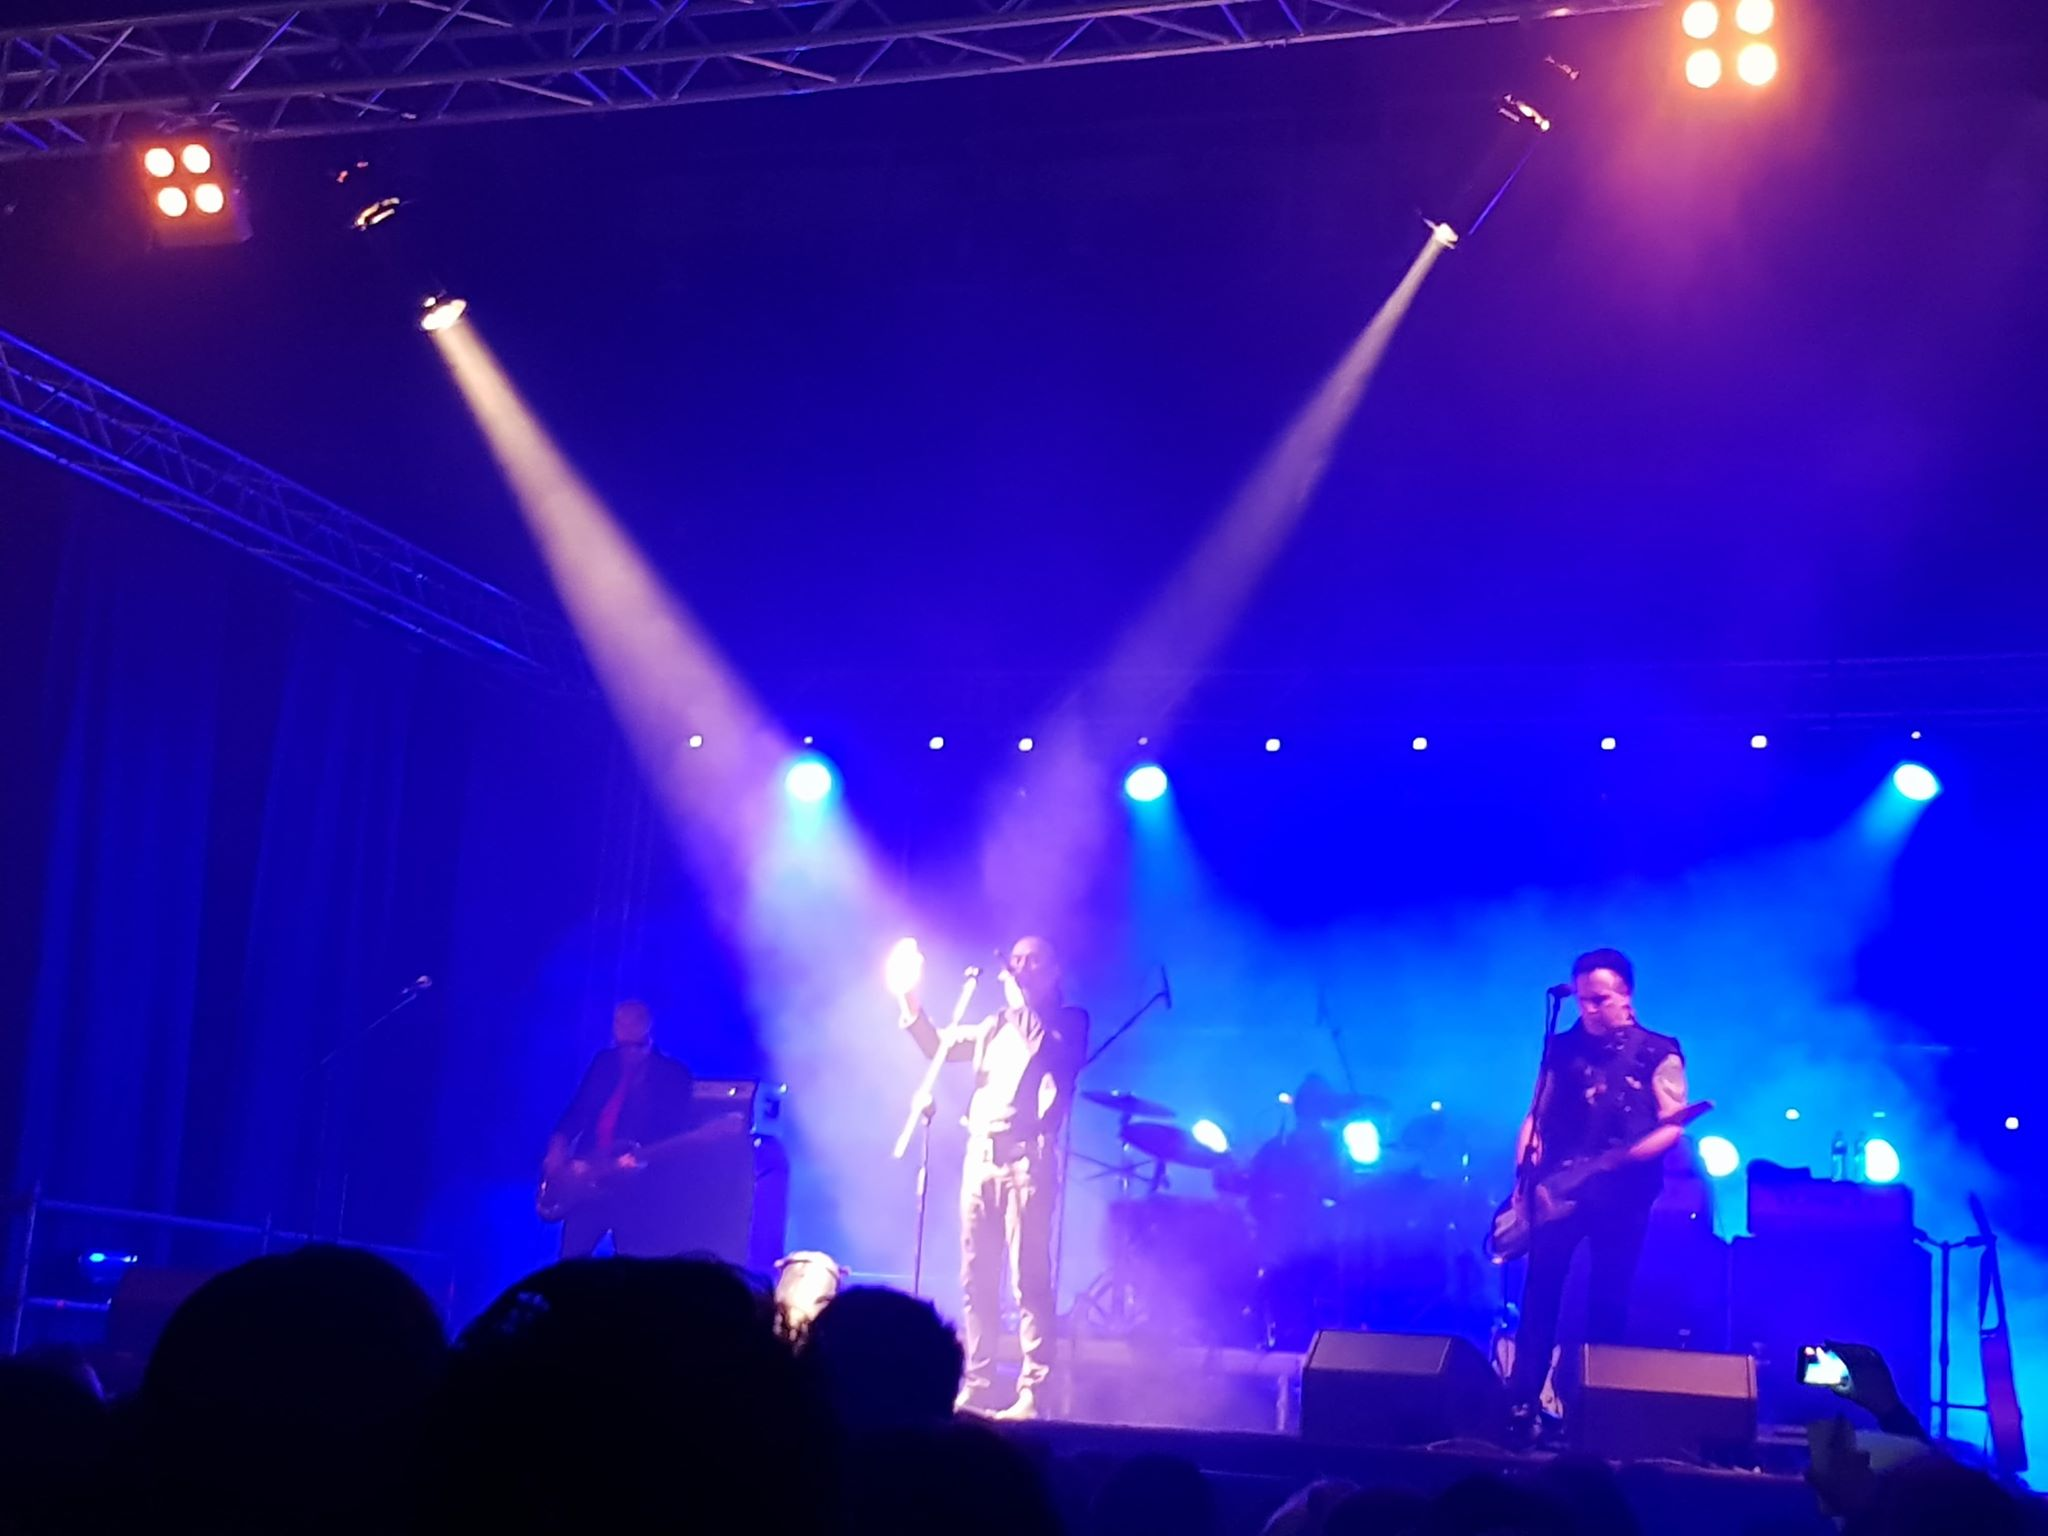 peter-murphy-ejekt-festival-2018-02